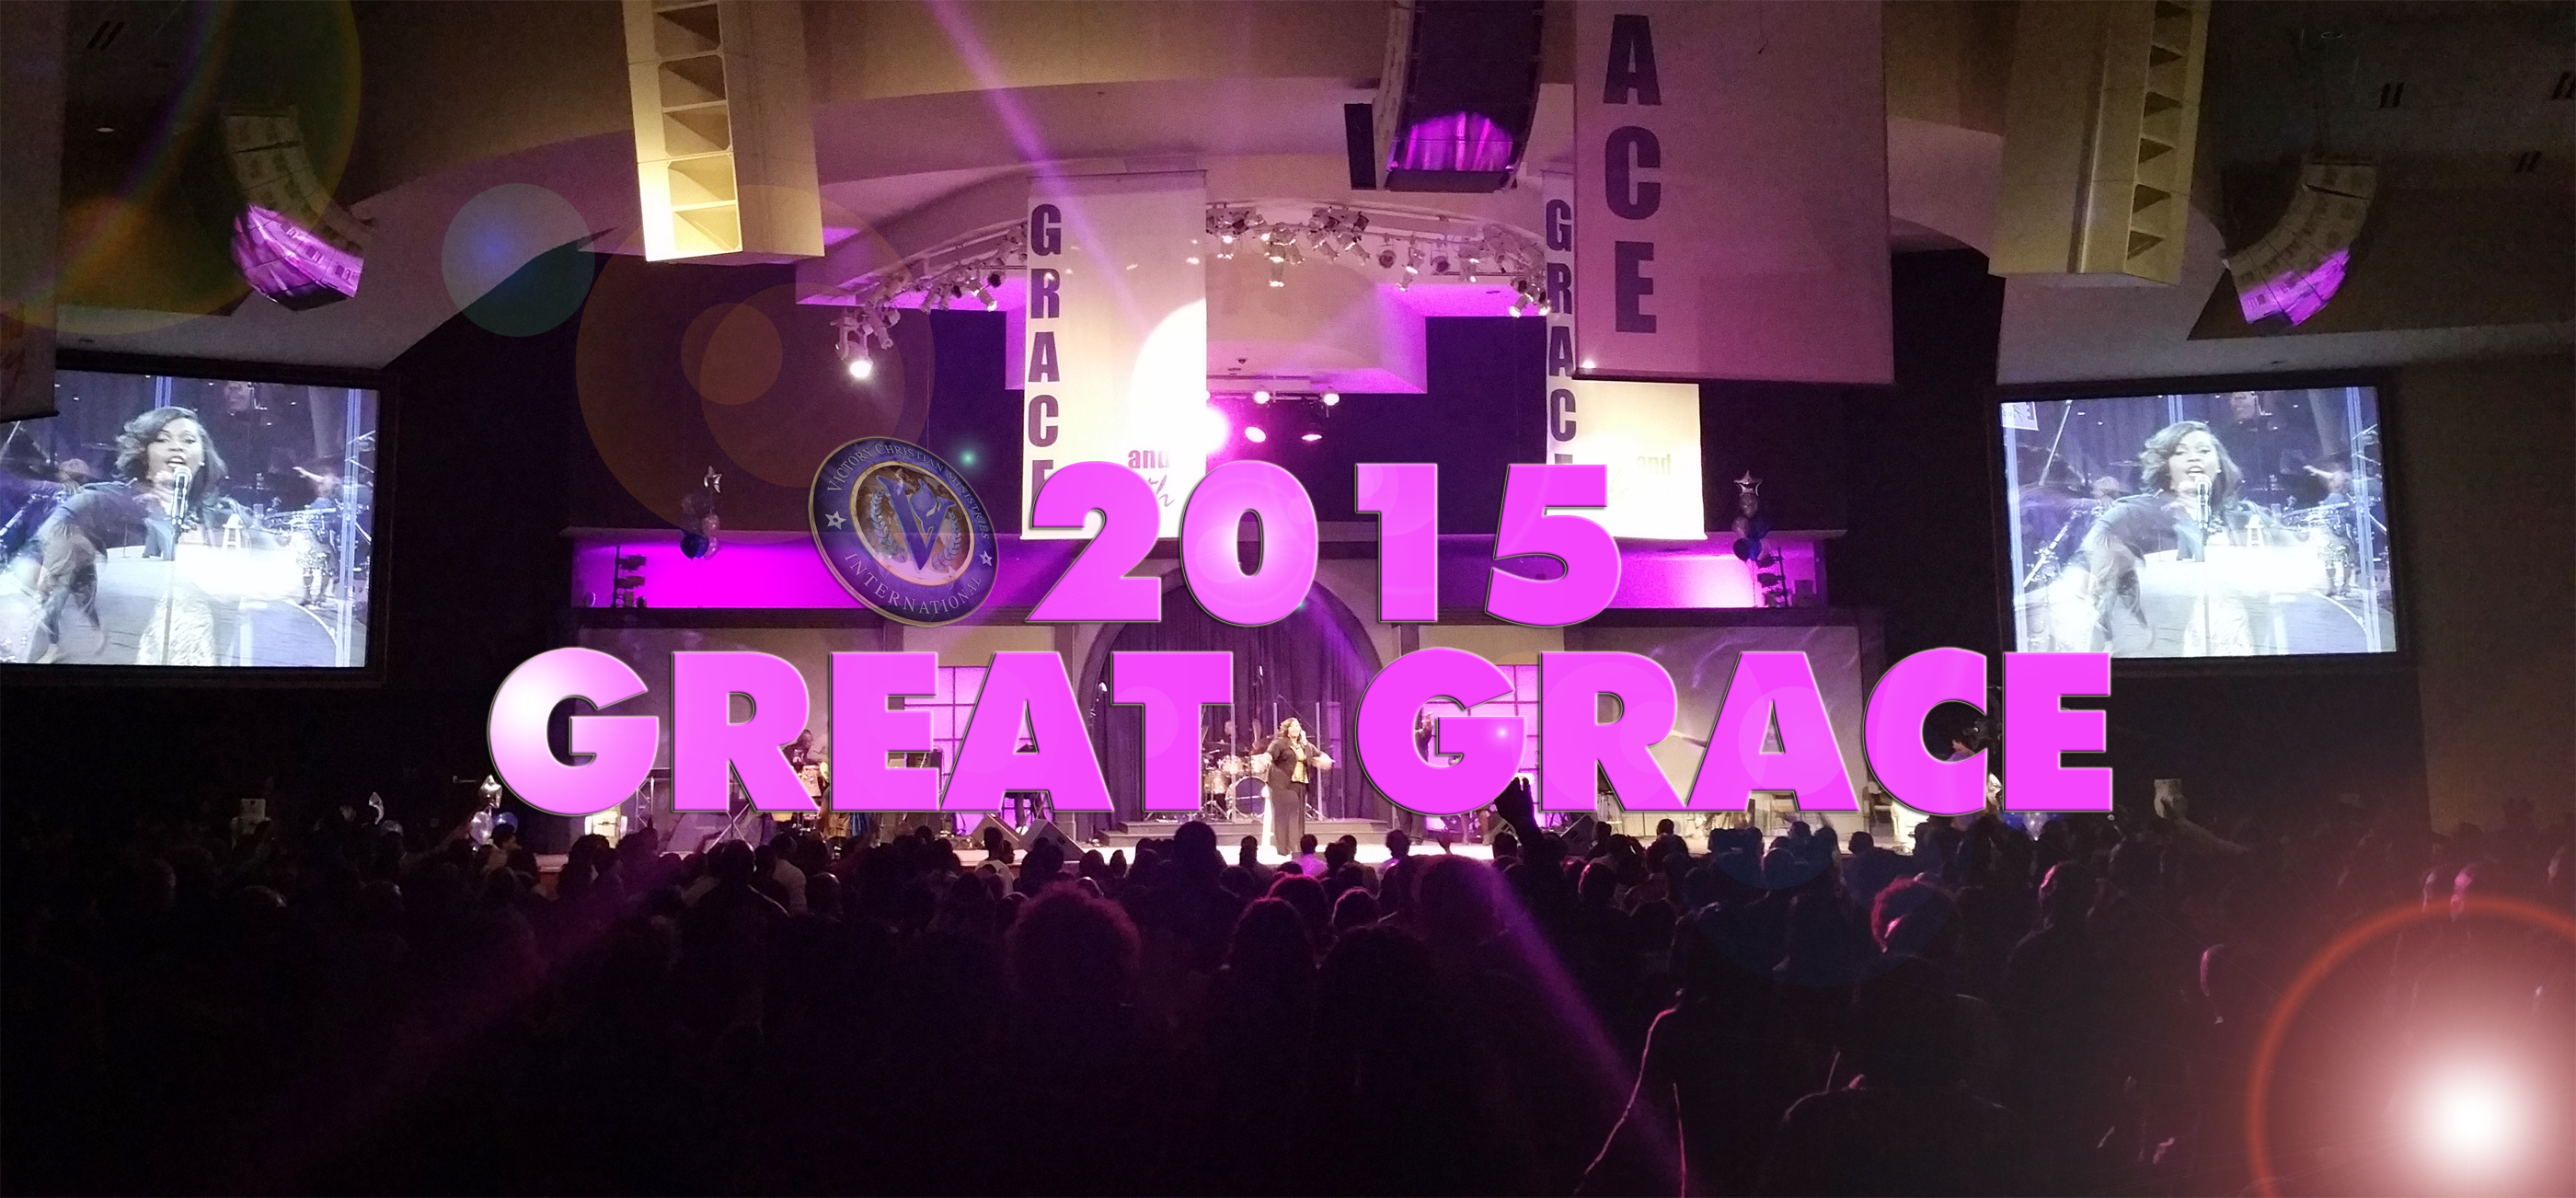 2015 Great Grace VCMI_2800.png